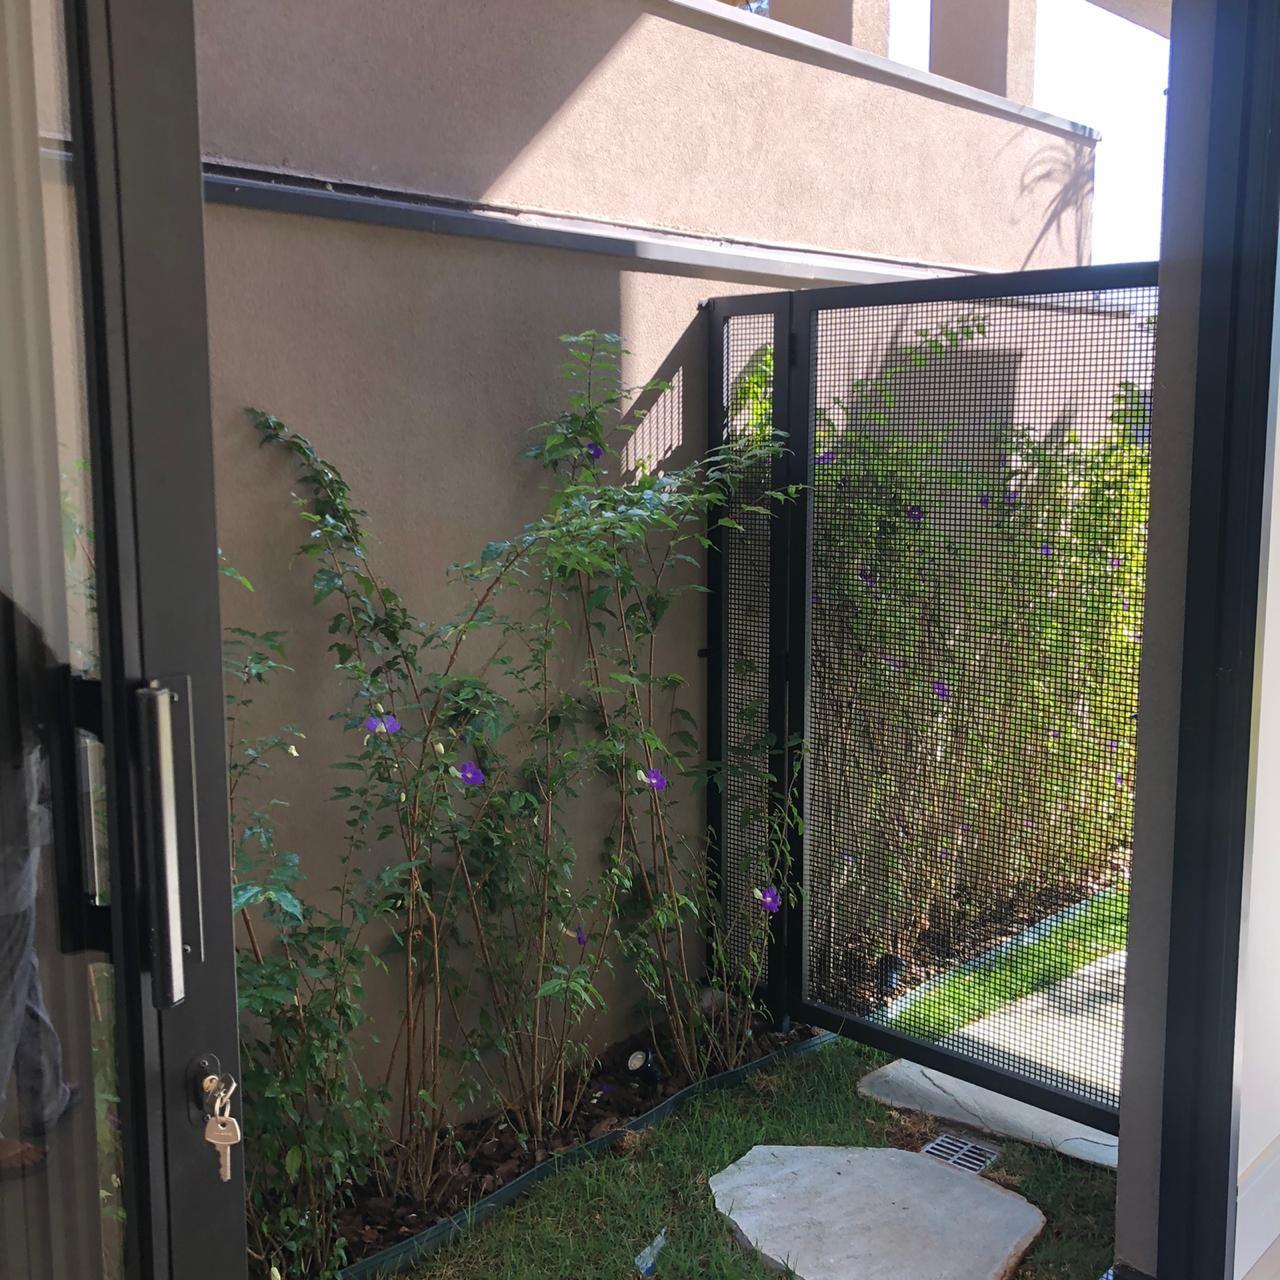 741 - Casa Terras de Florença 3 Suítes, 200m²